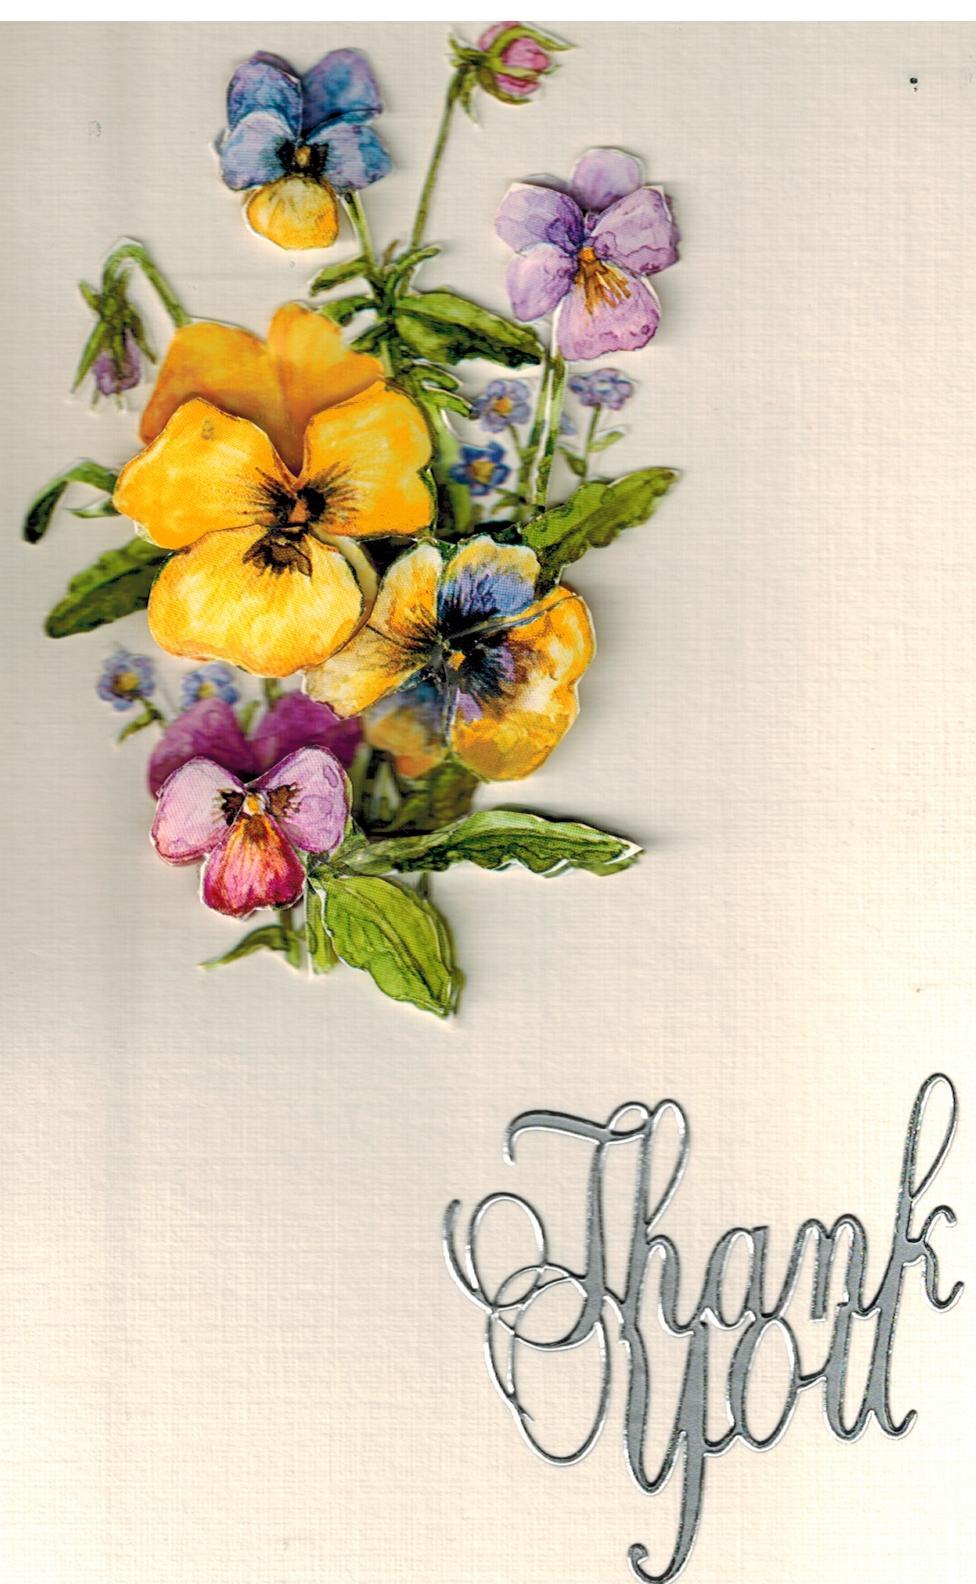 Q033a_Thank-You_[Margaret_Sheila]